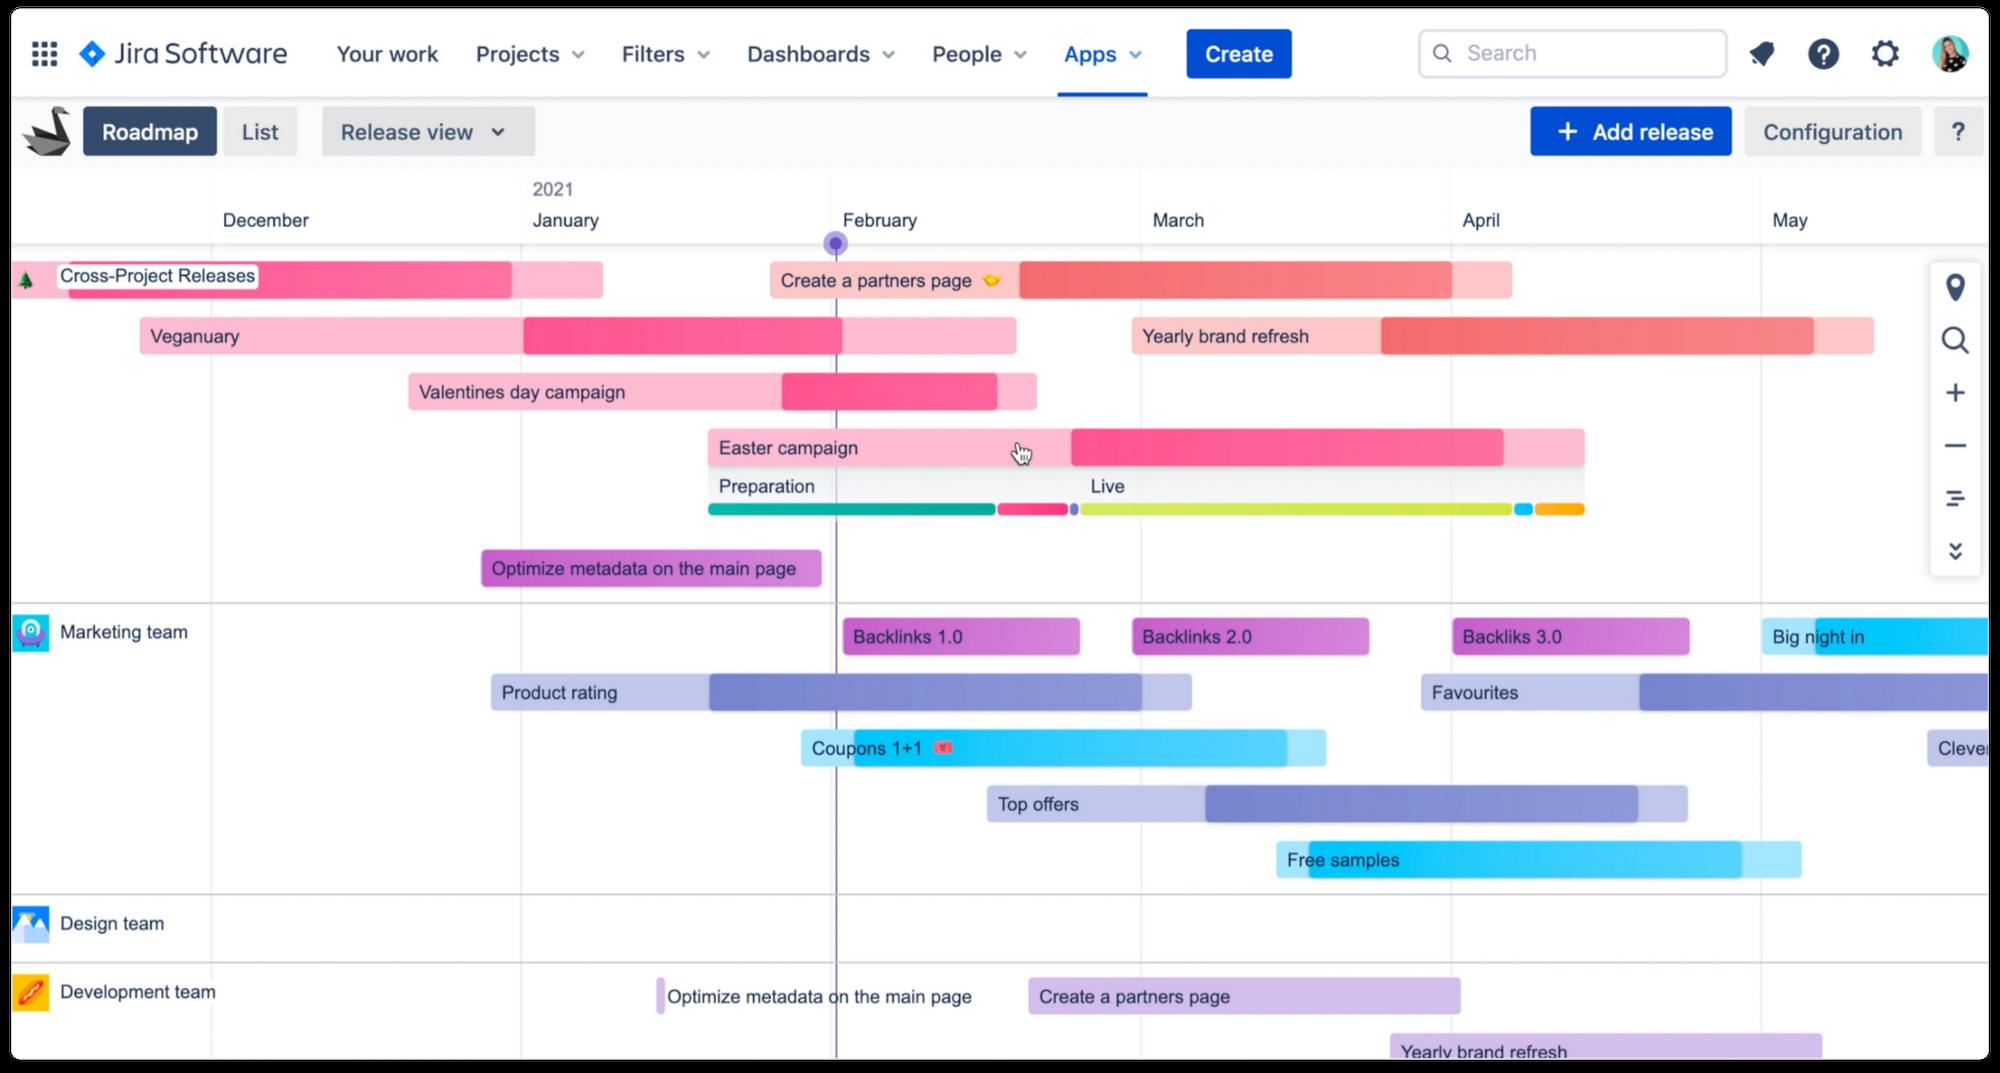 Swanly: project portfolio roadmap timeline for Jira